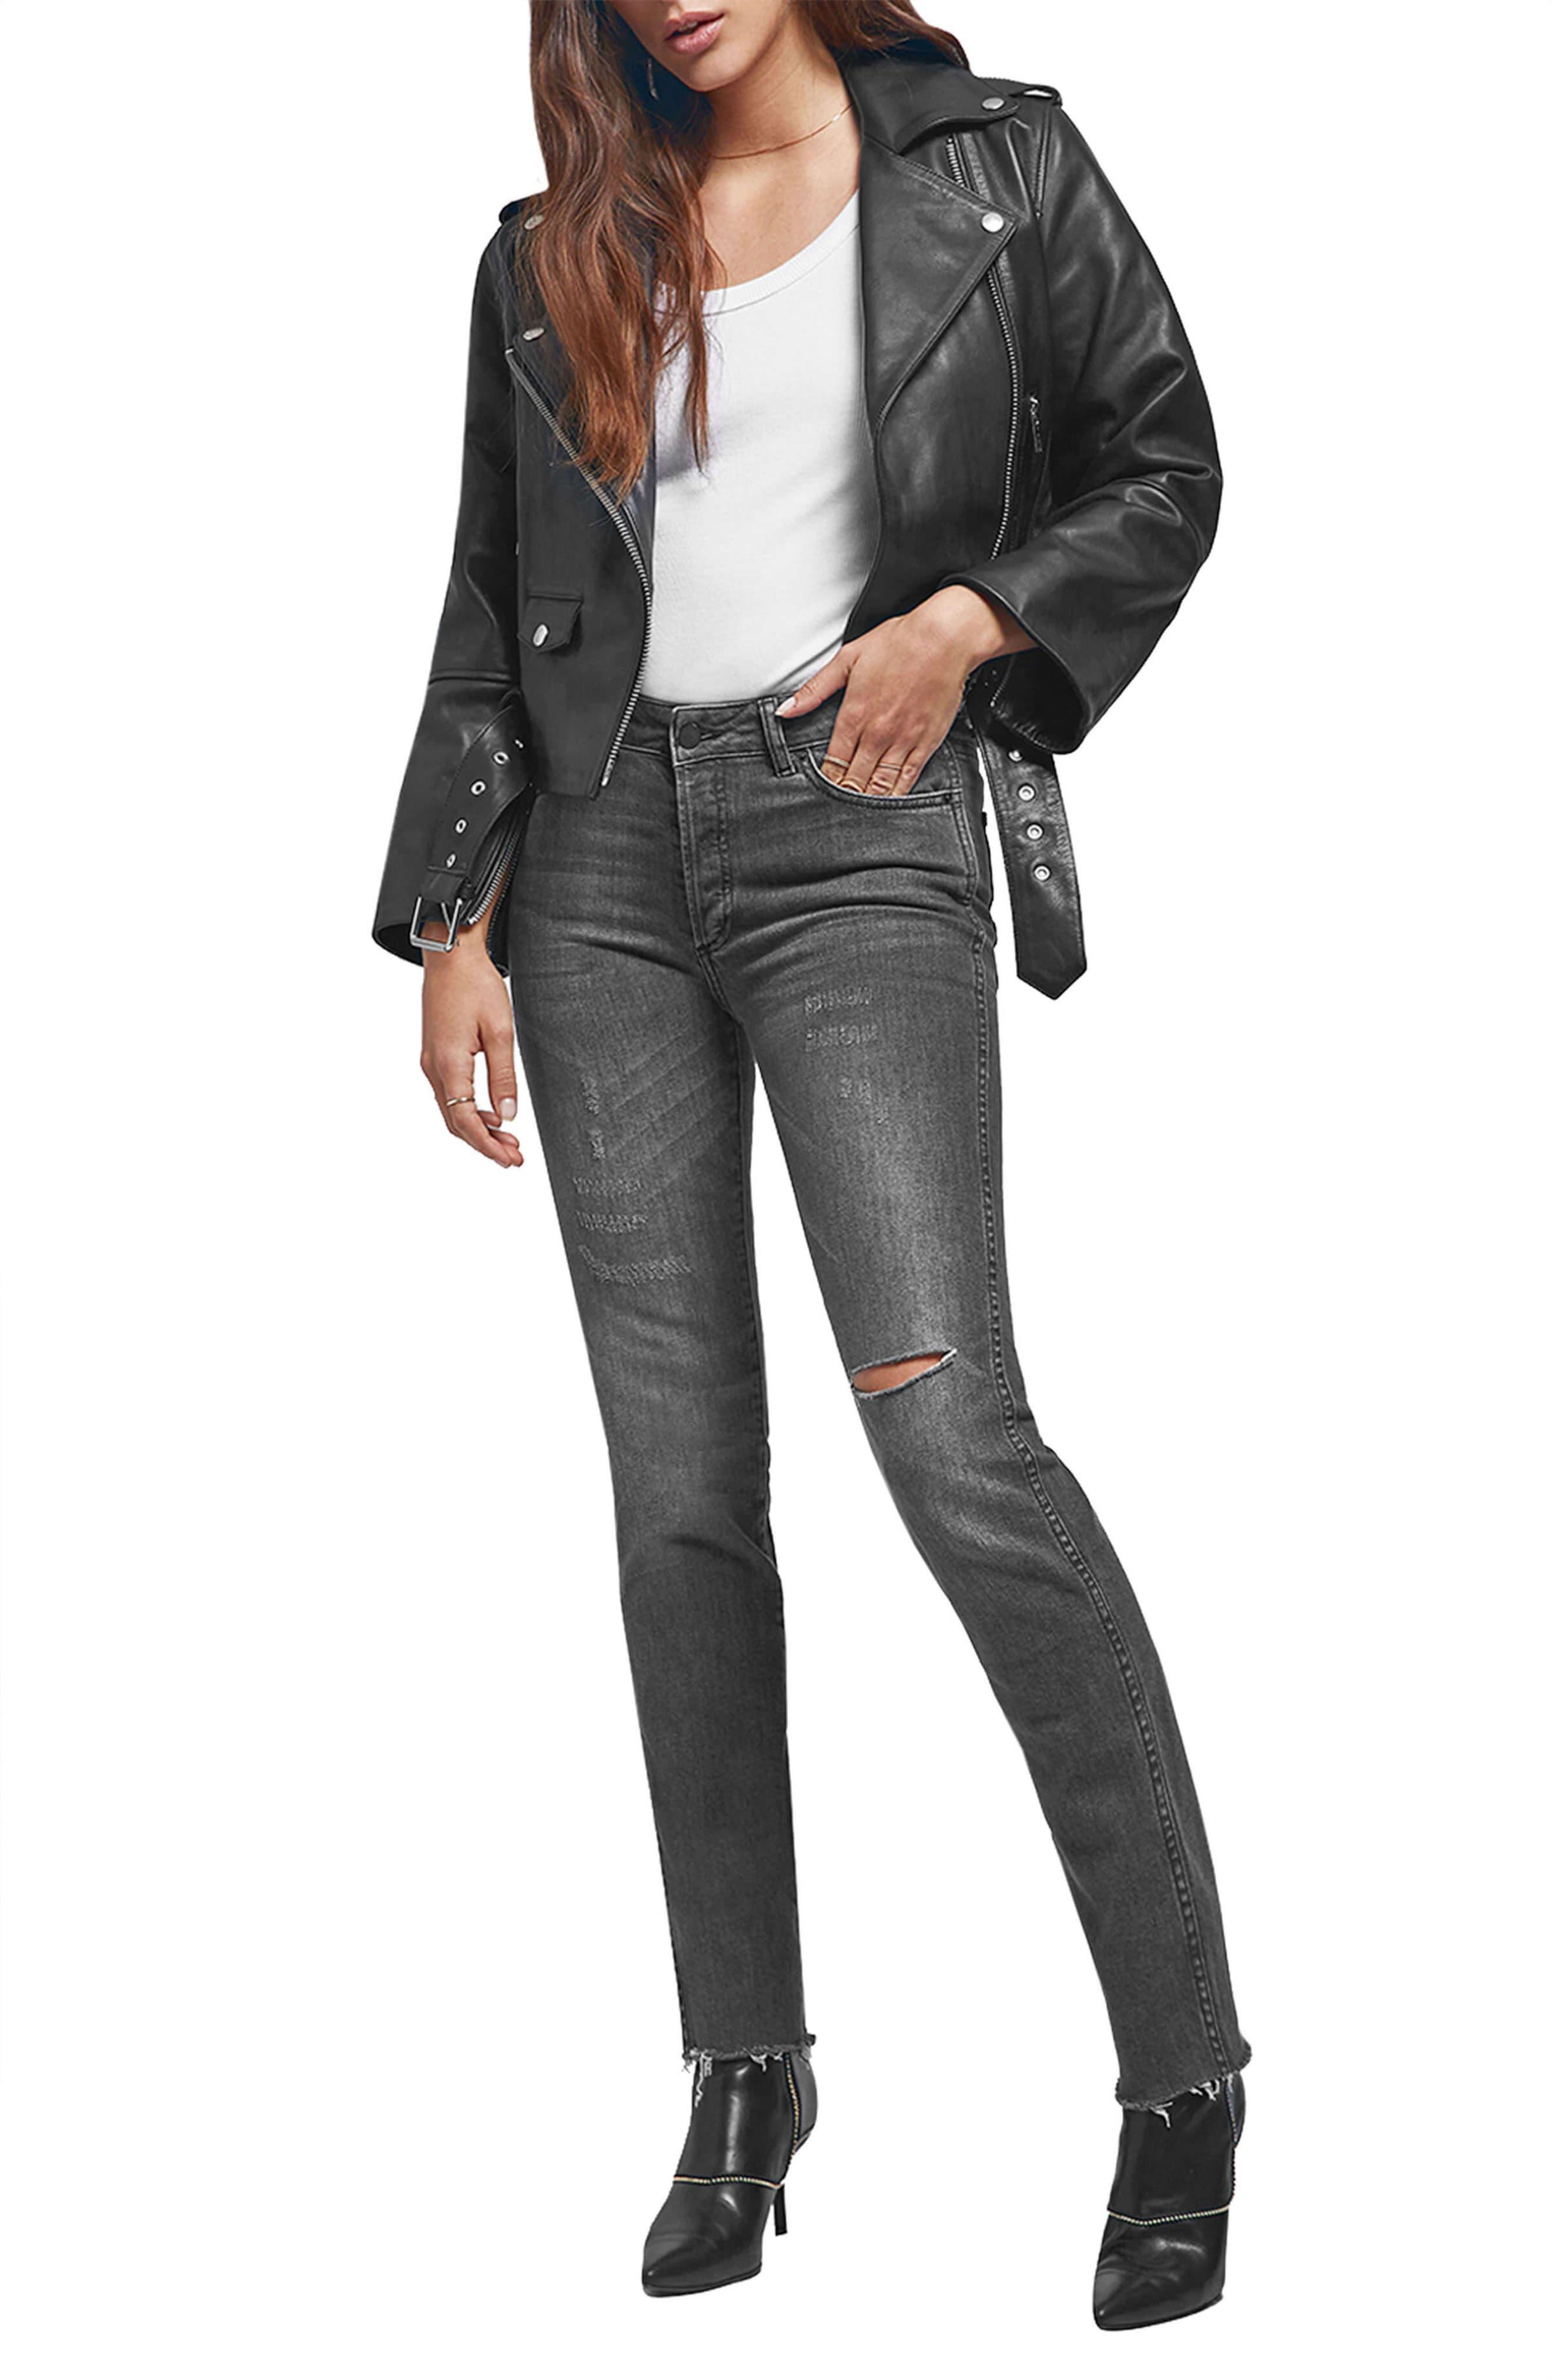 Kara Skinny Jeans,                             Alternate thumbnail 6, color,                             CHARCOAL